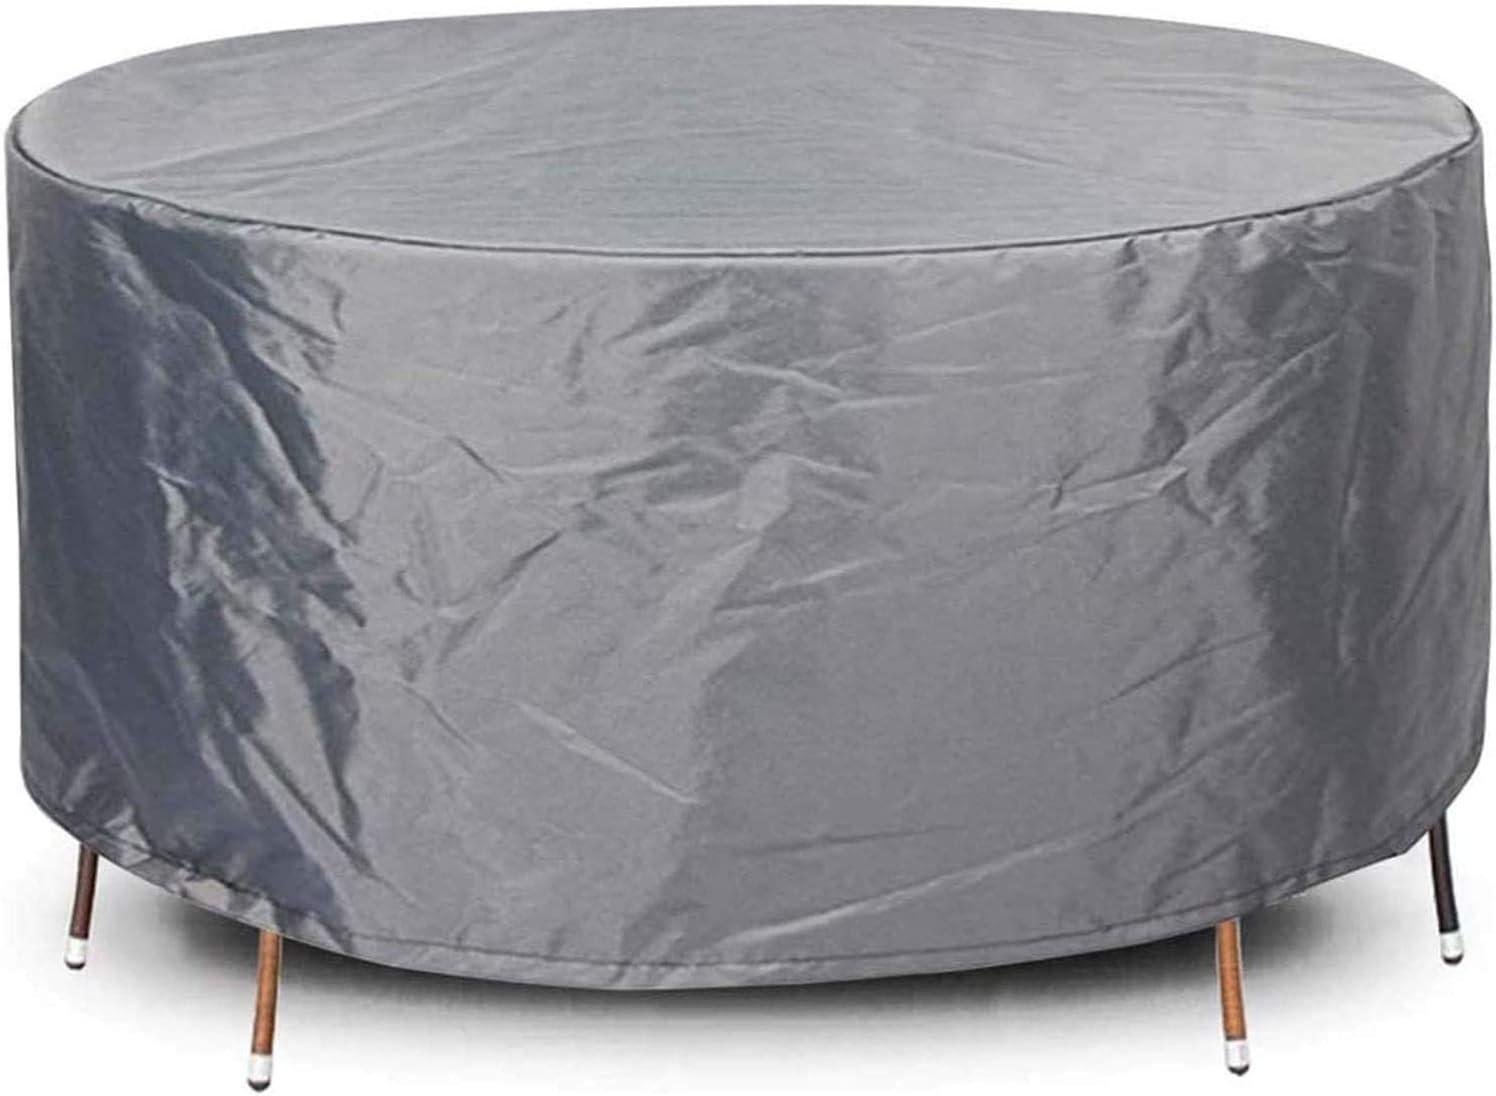 QIAOH Round Garden Furniture Covers Patio Max 73% OFF 45x24in Fu Milwaukee Mall Waterproof